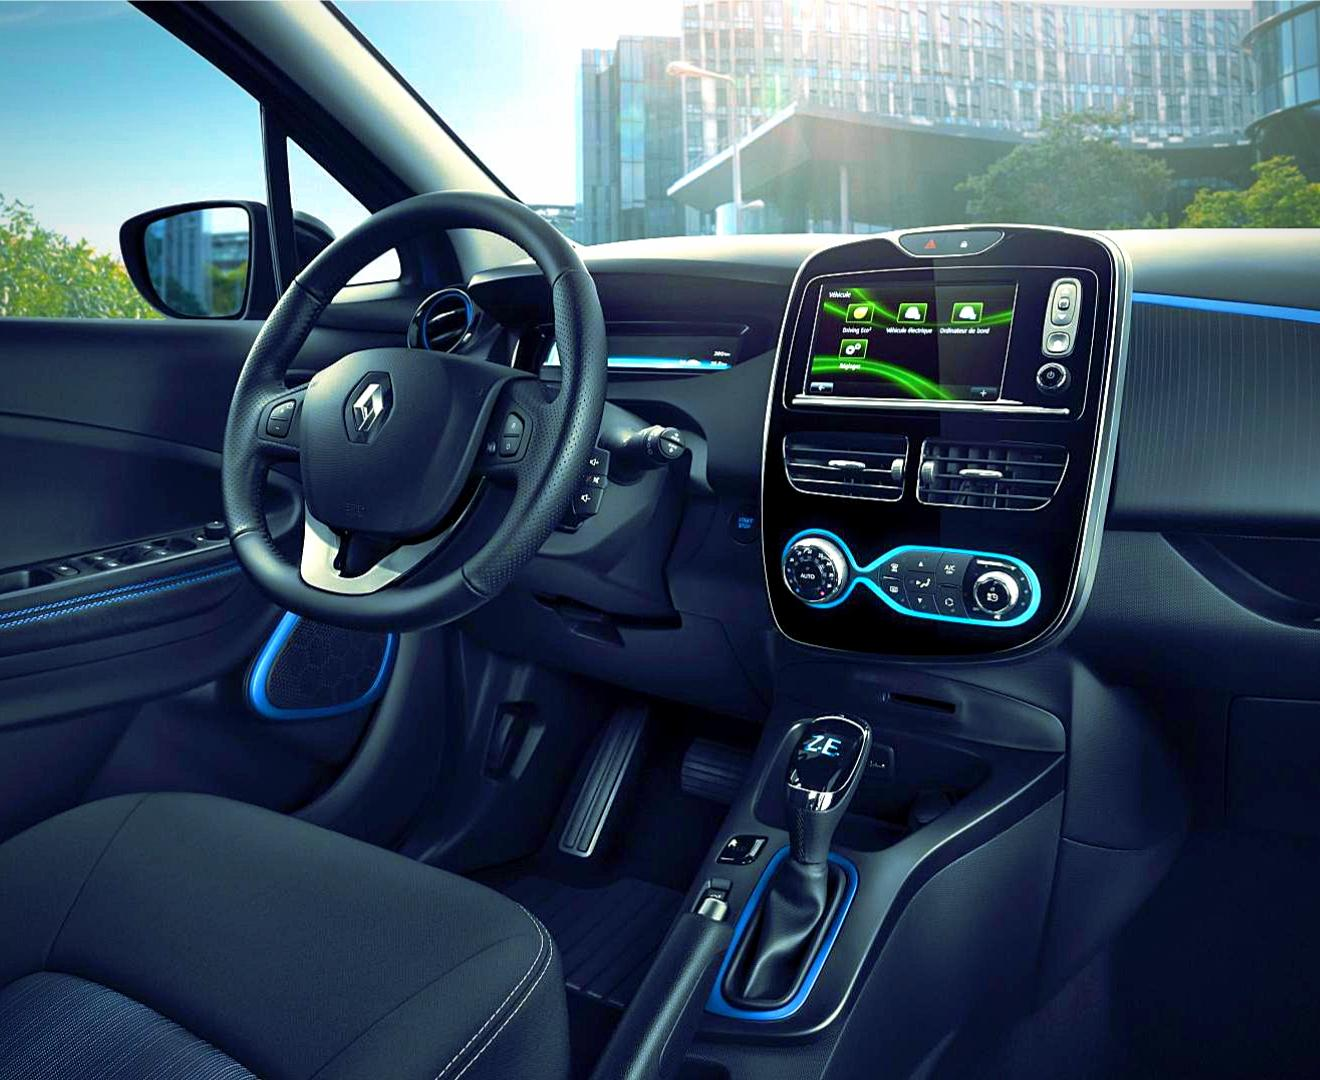 Renault ZOE Innenraumansicht